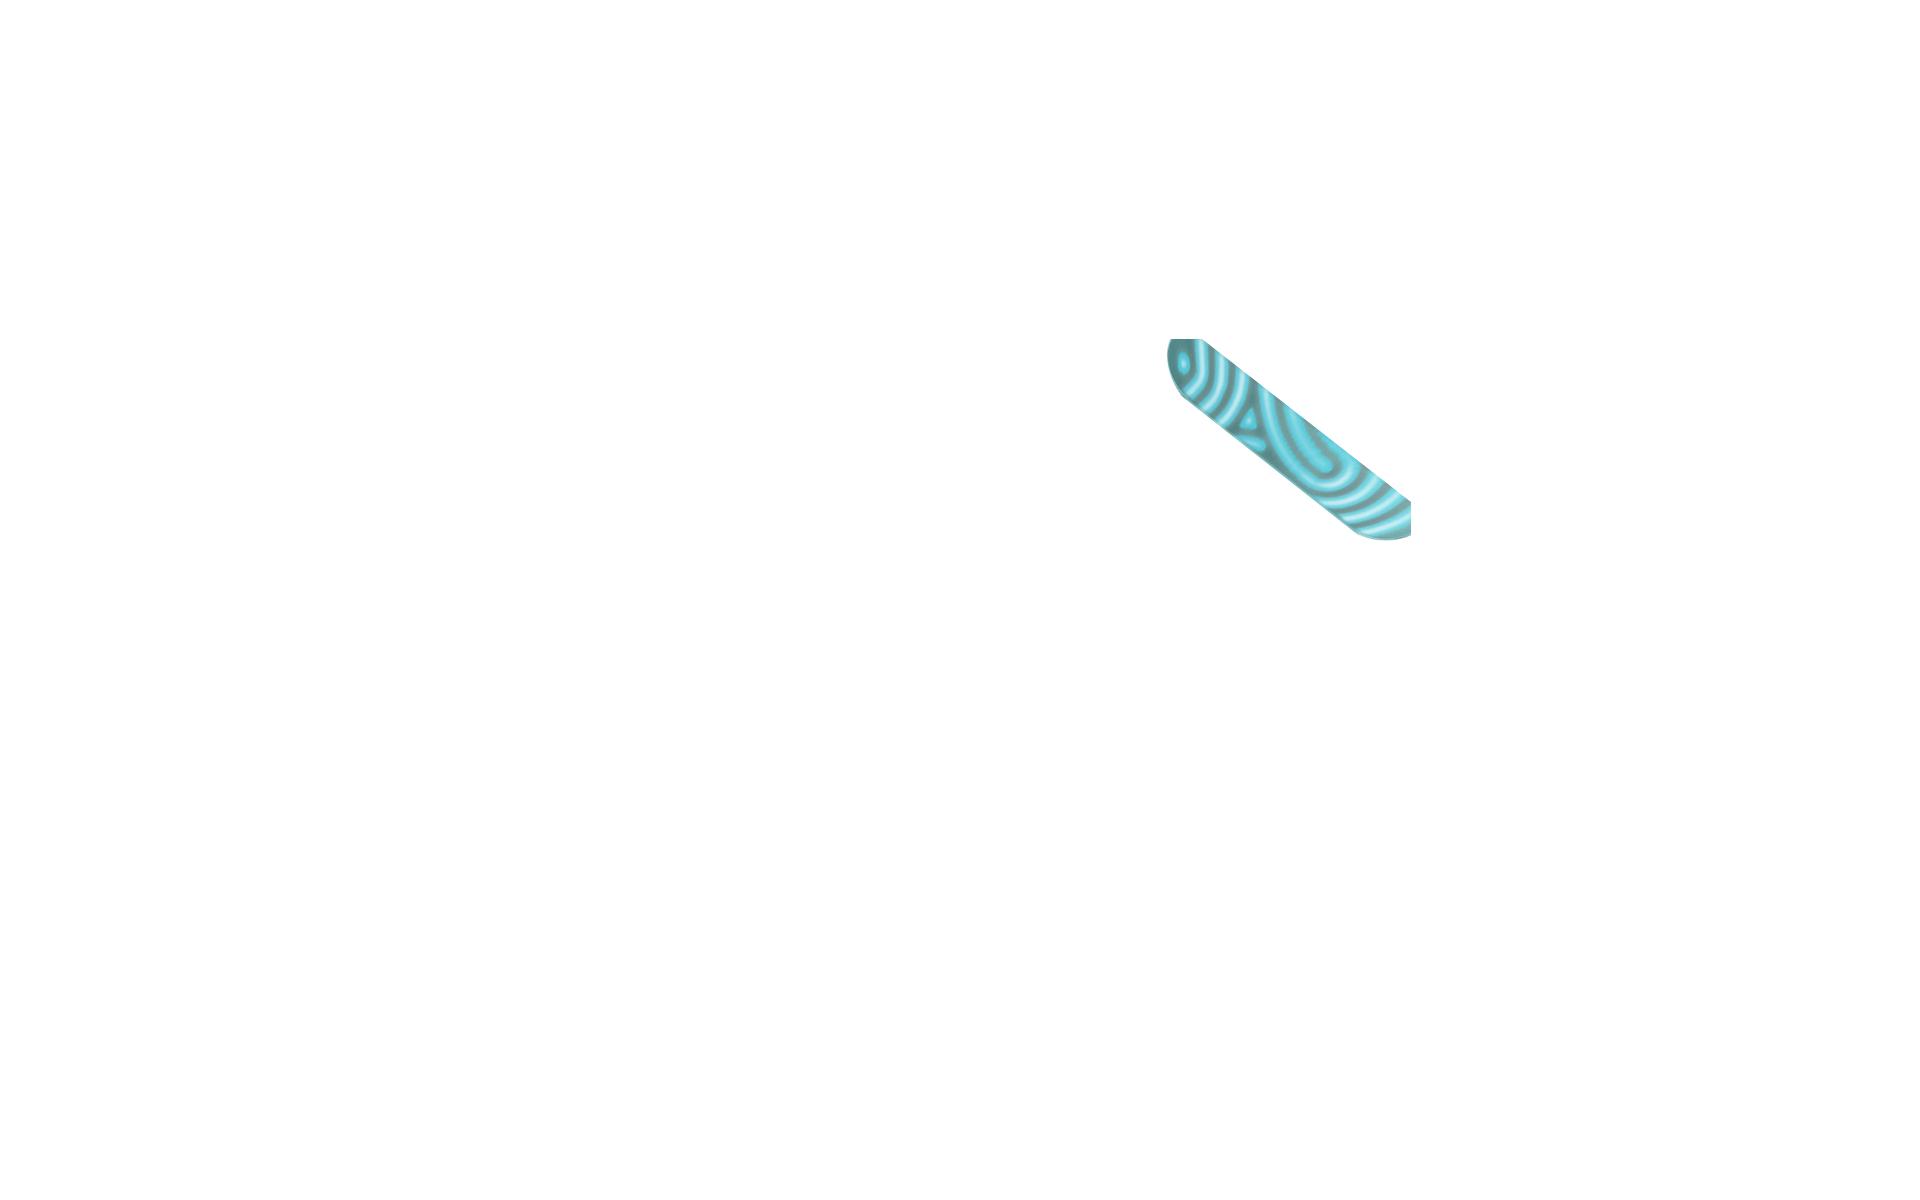 Side-Mounted Fingerprint Sensor